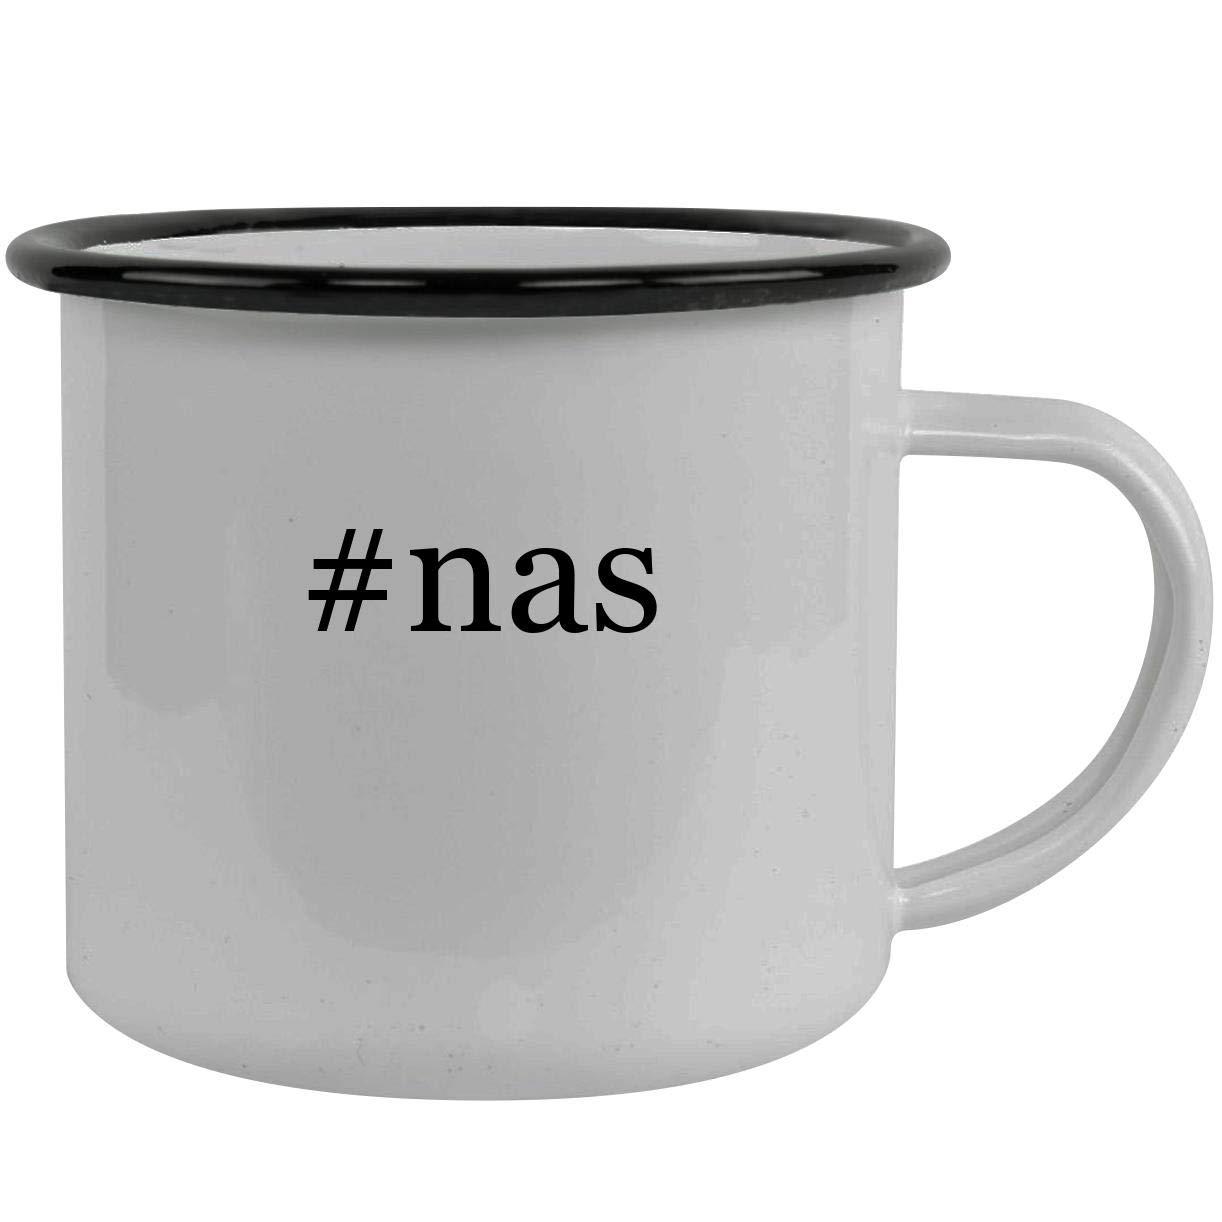 #nas - Stainless Steel Hashtag 12oz Camping Mug